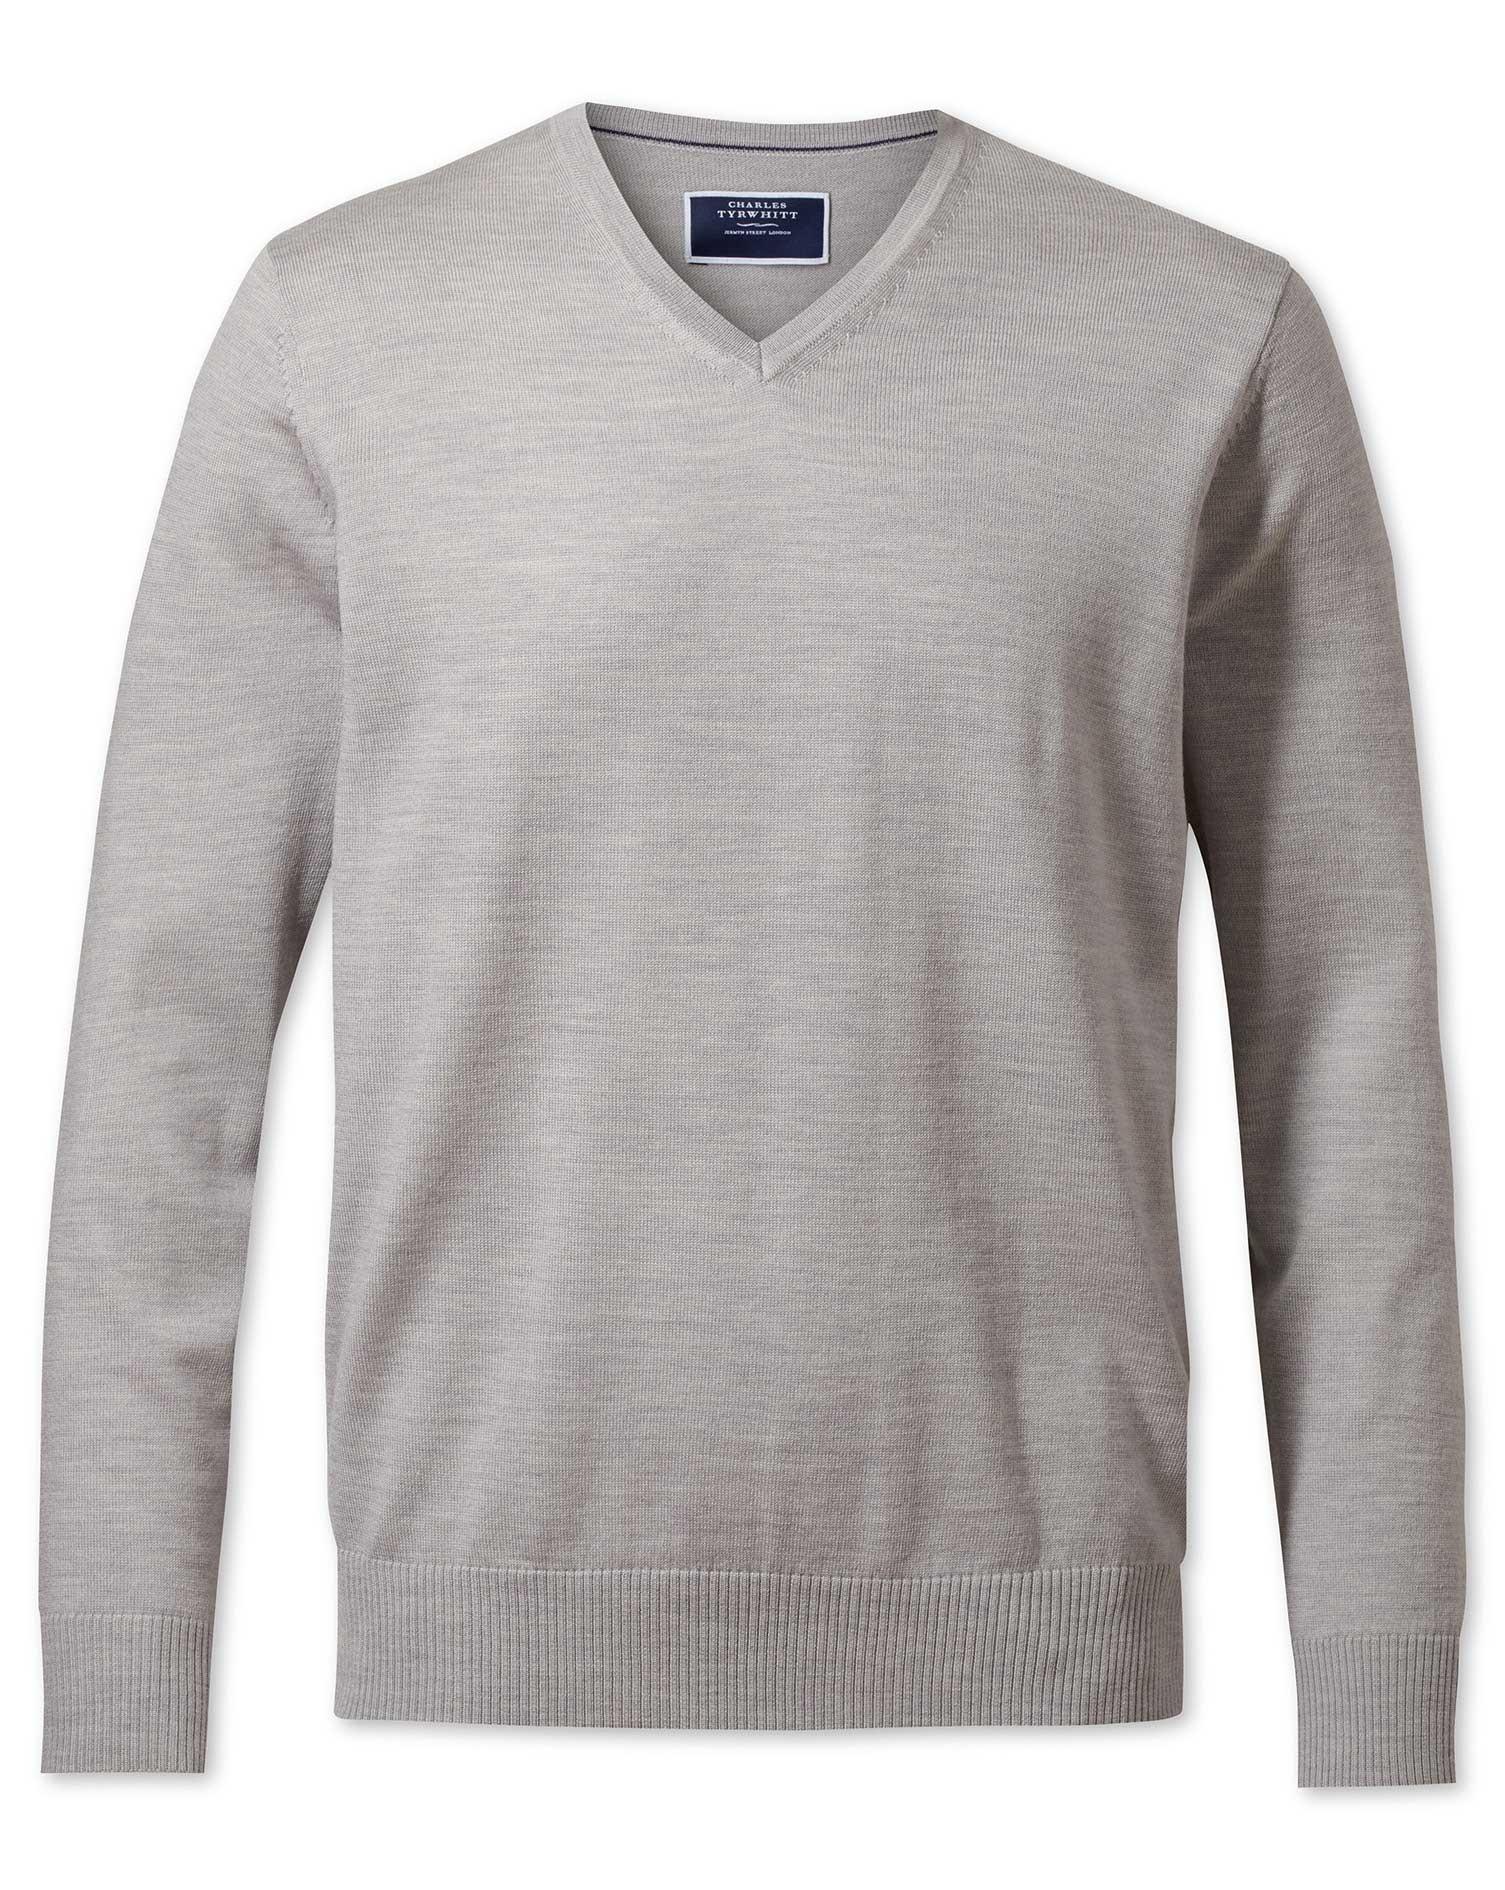 Silver merino wool v neck sweater